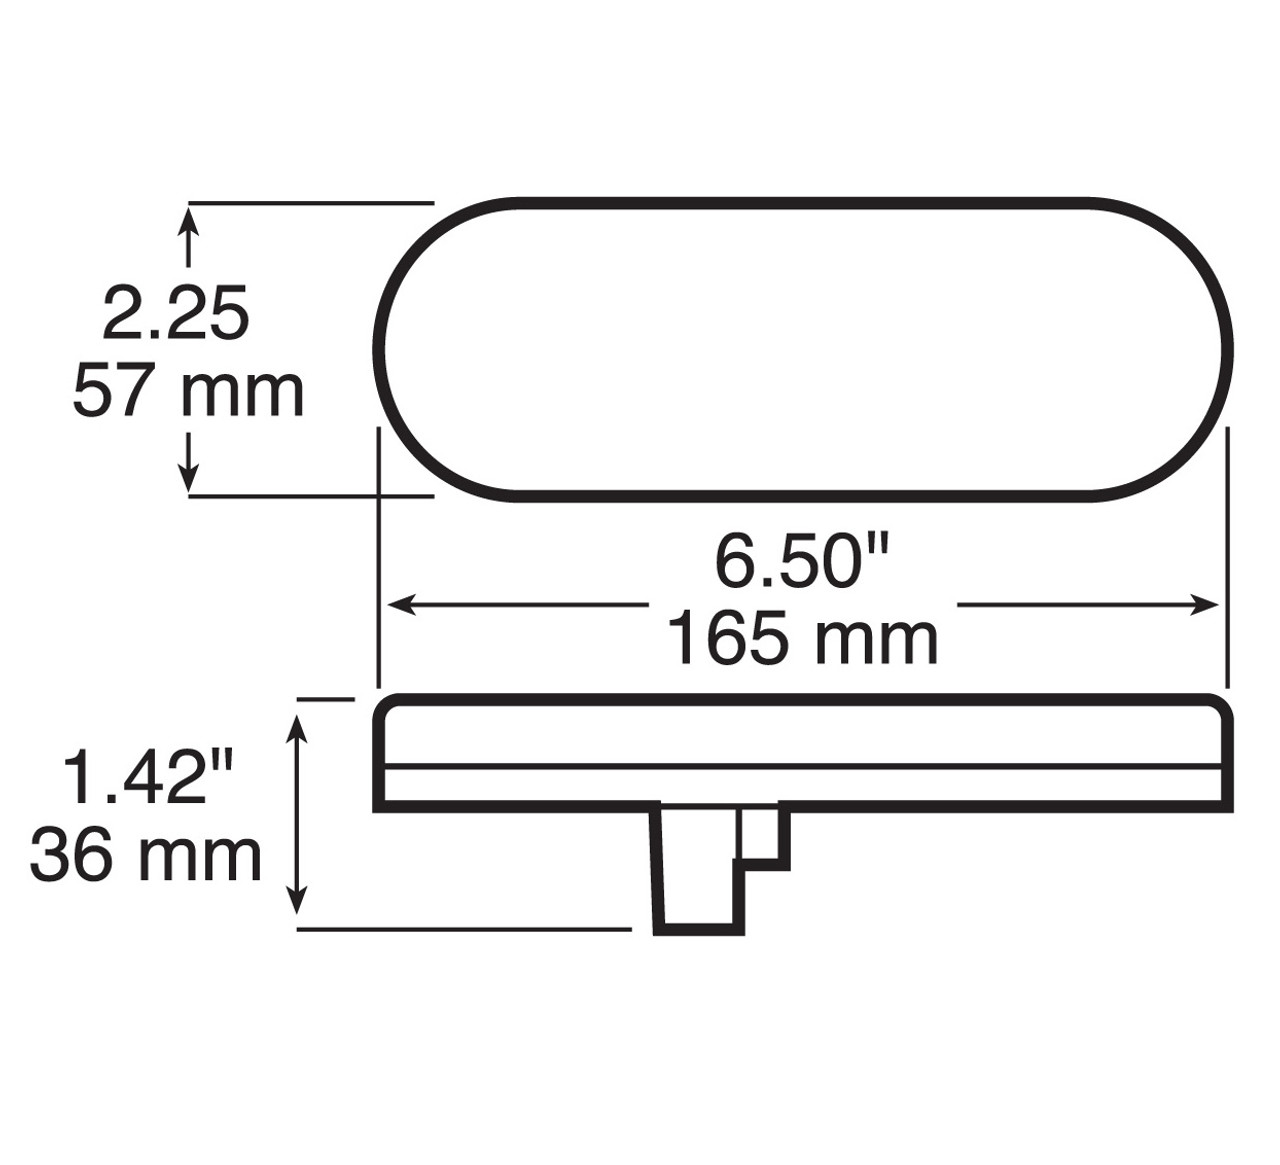 LED870C10 --- Touch Light - Oval Sealed LED Interior/Dome Light